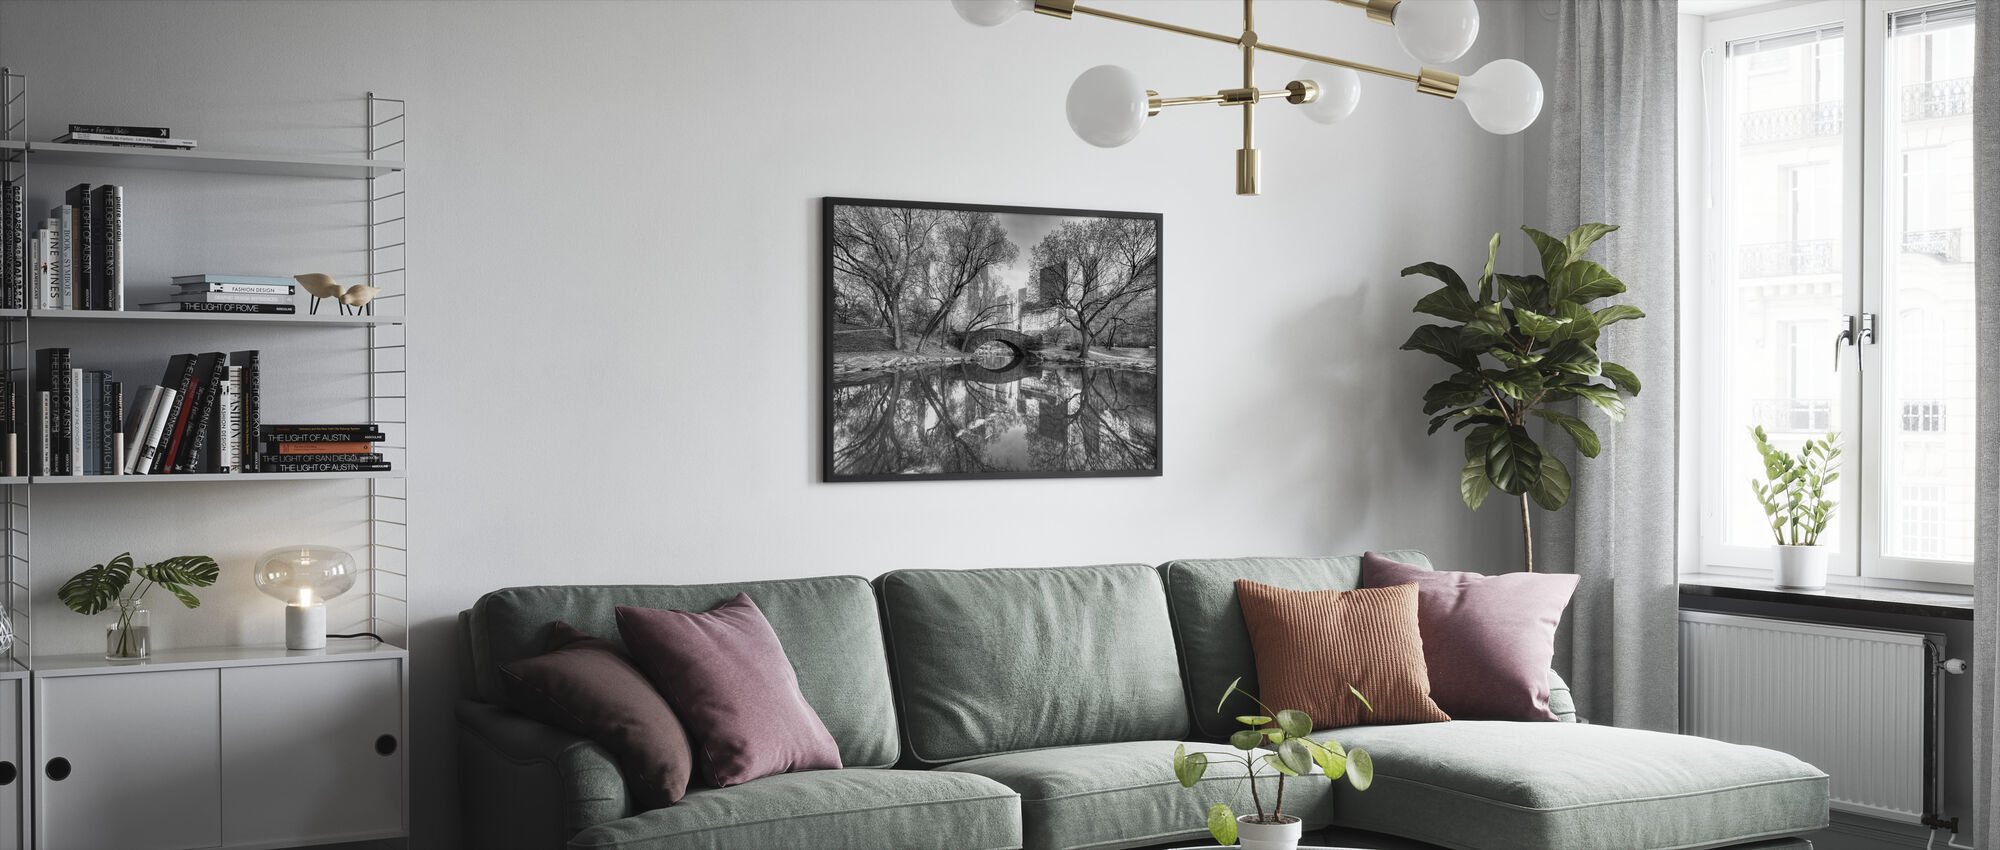 Bridge in Central Park - Framed print - Living Room